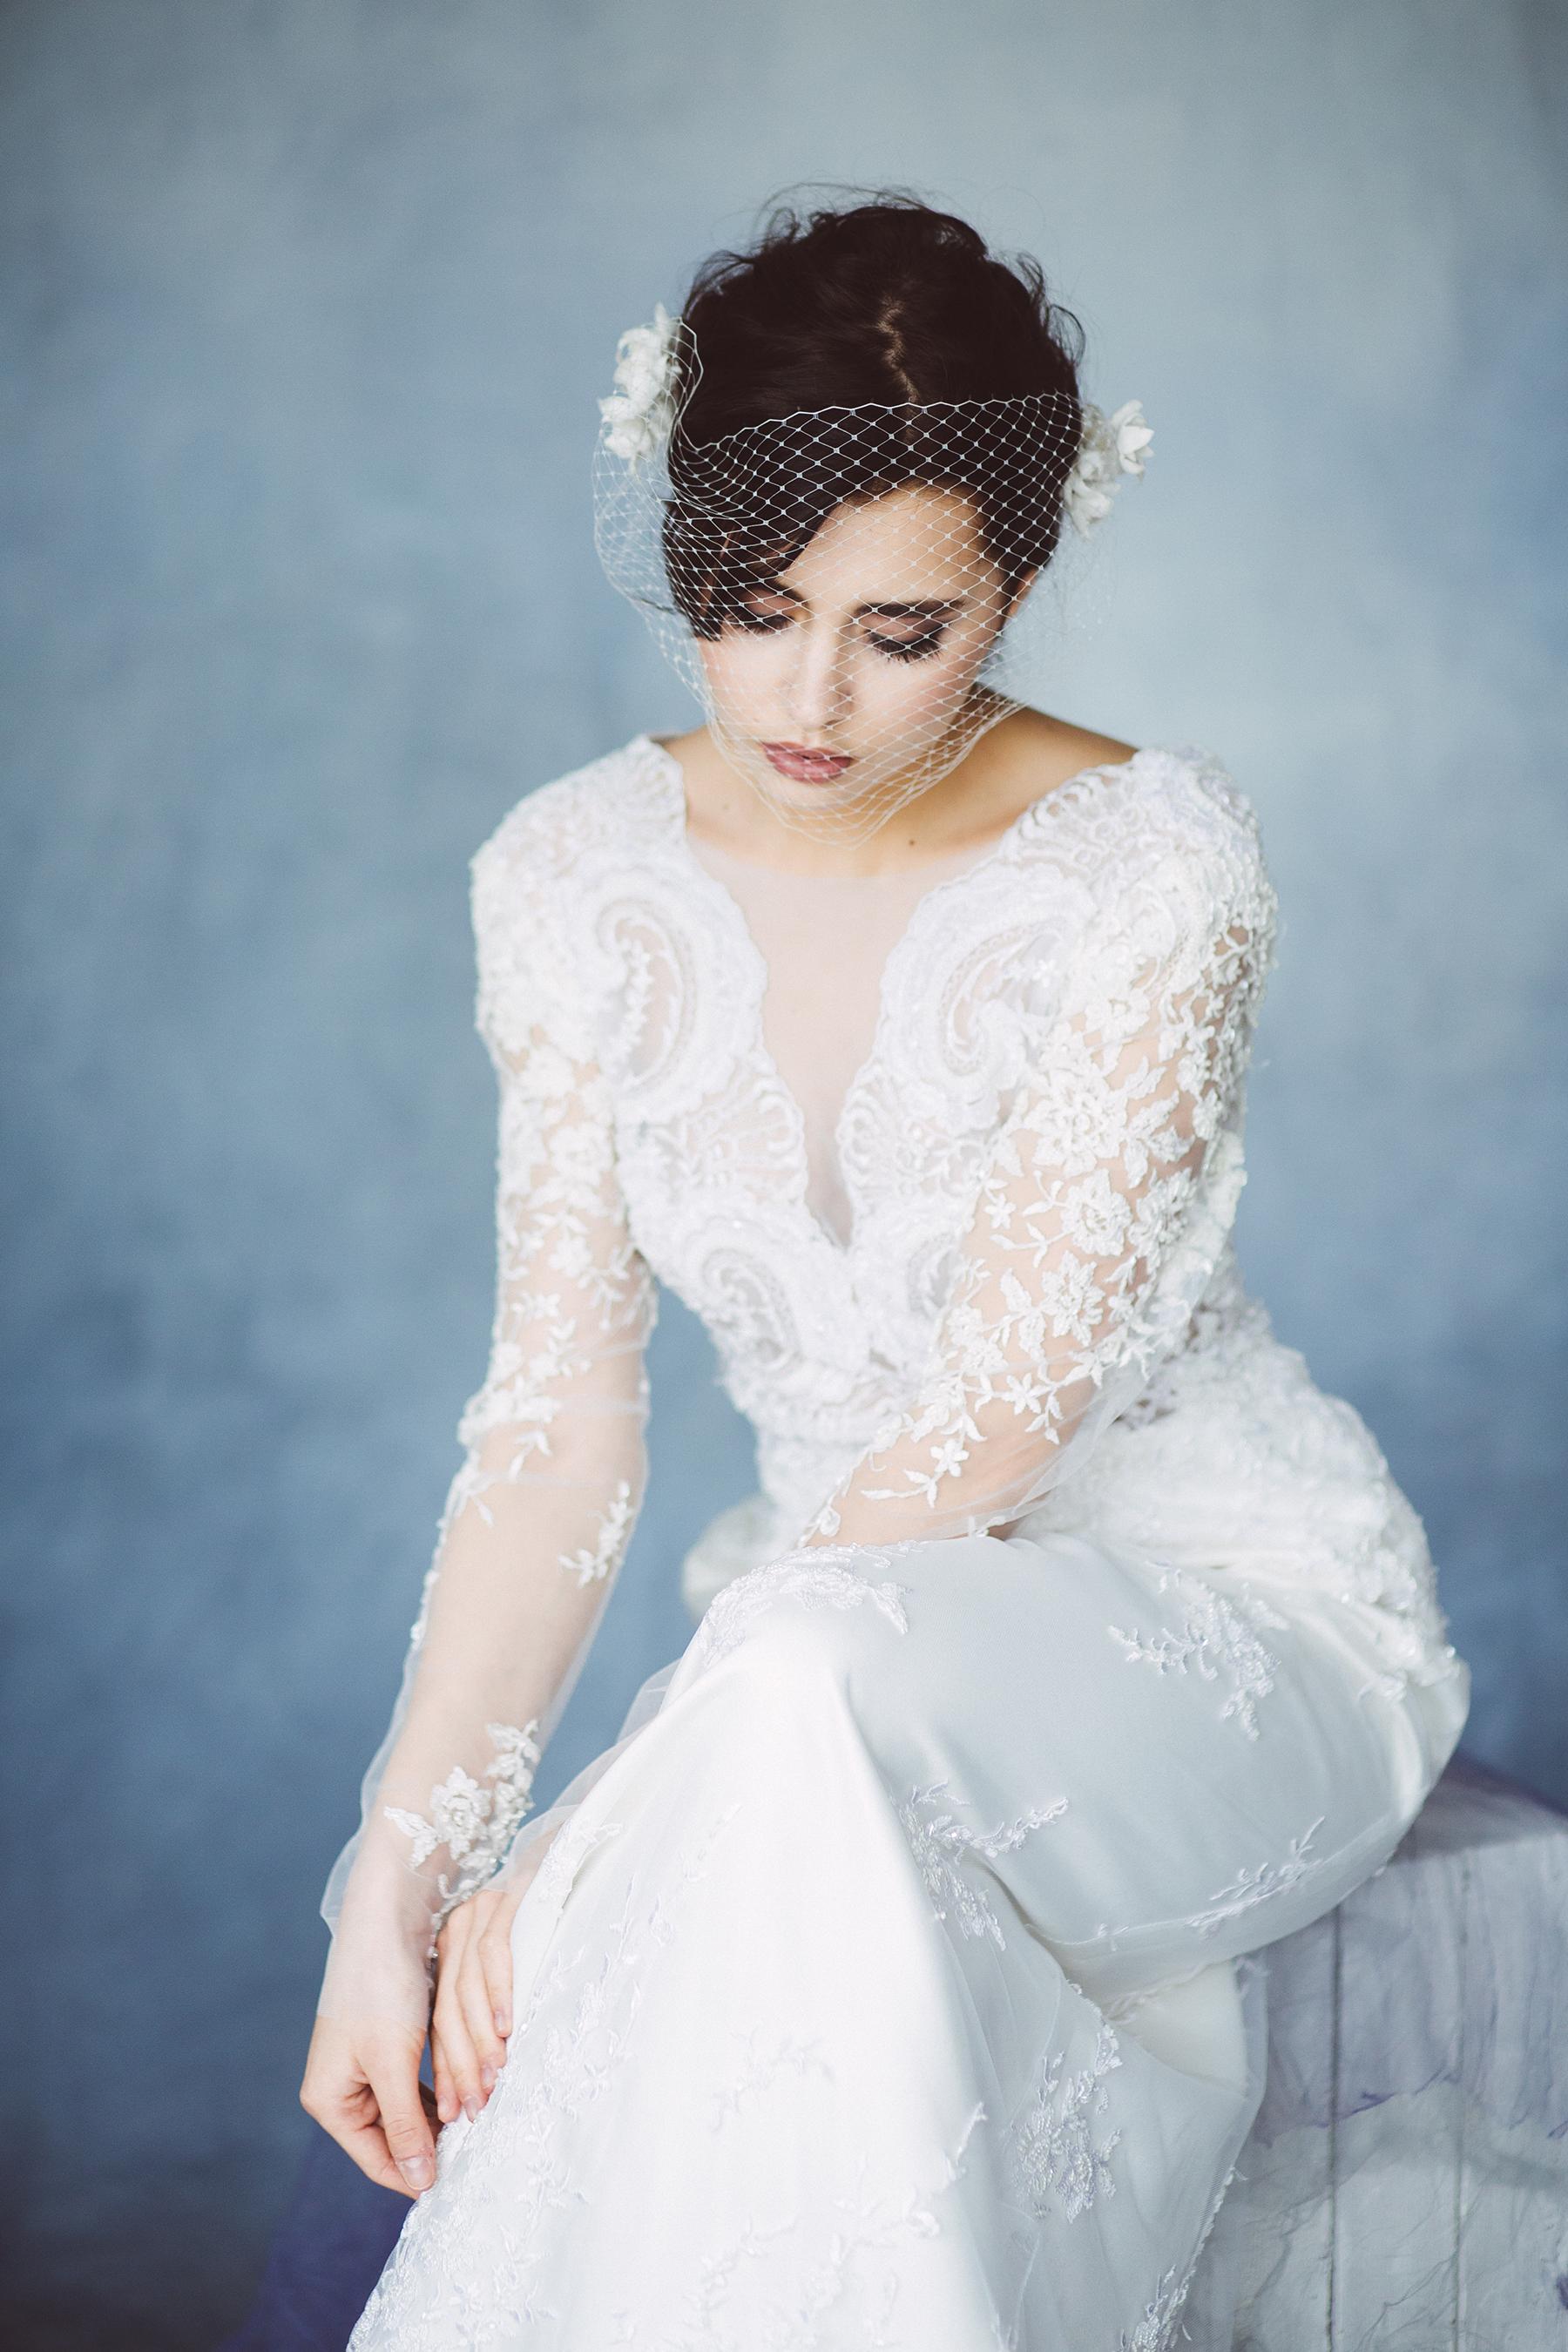 panna mloda w koronkowej sukni